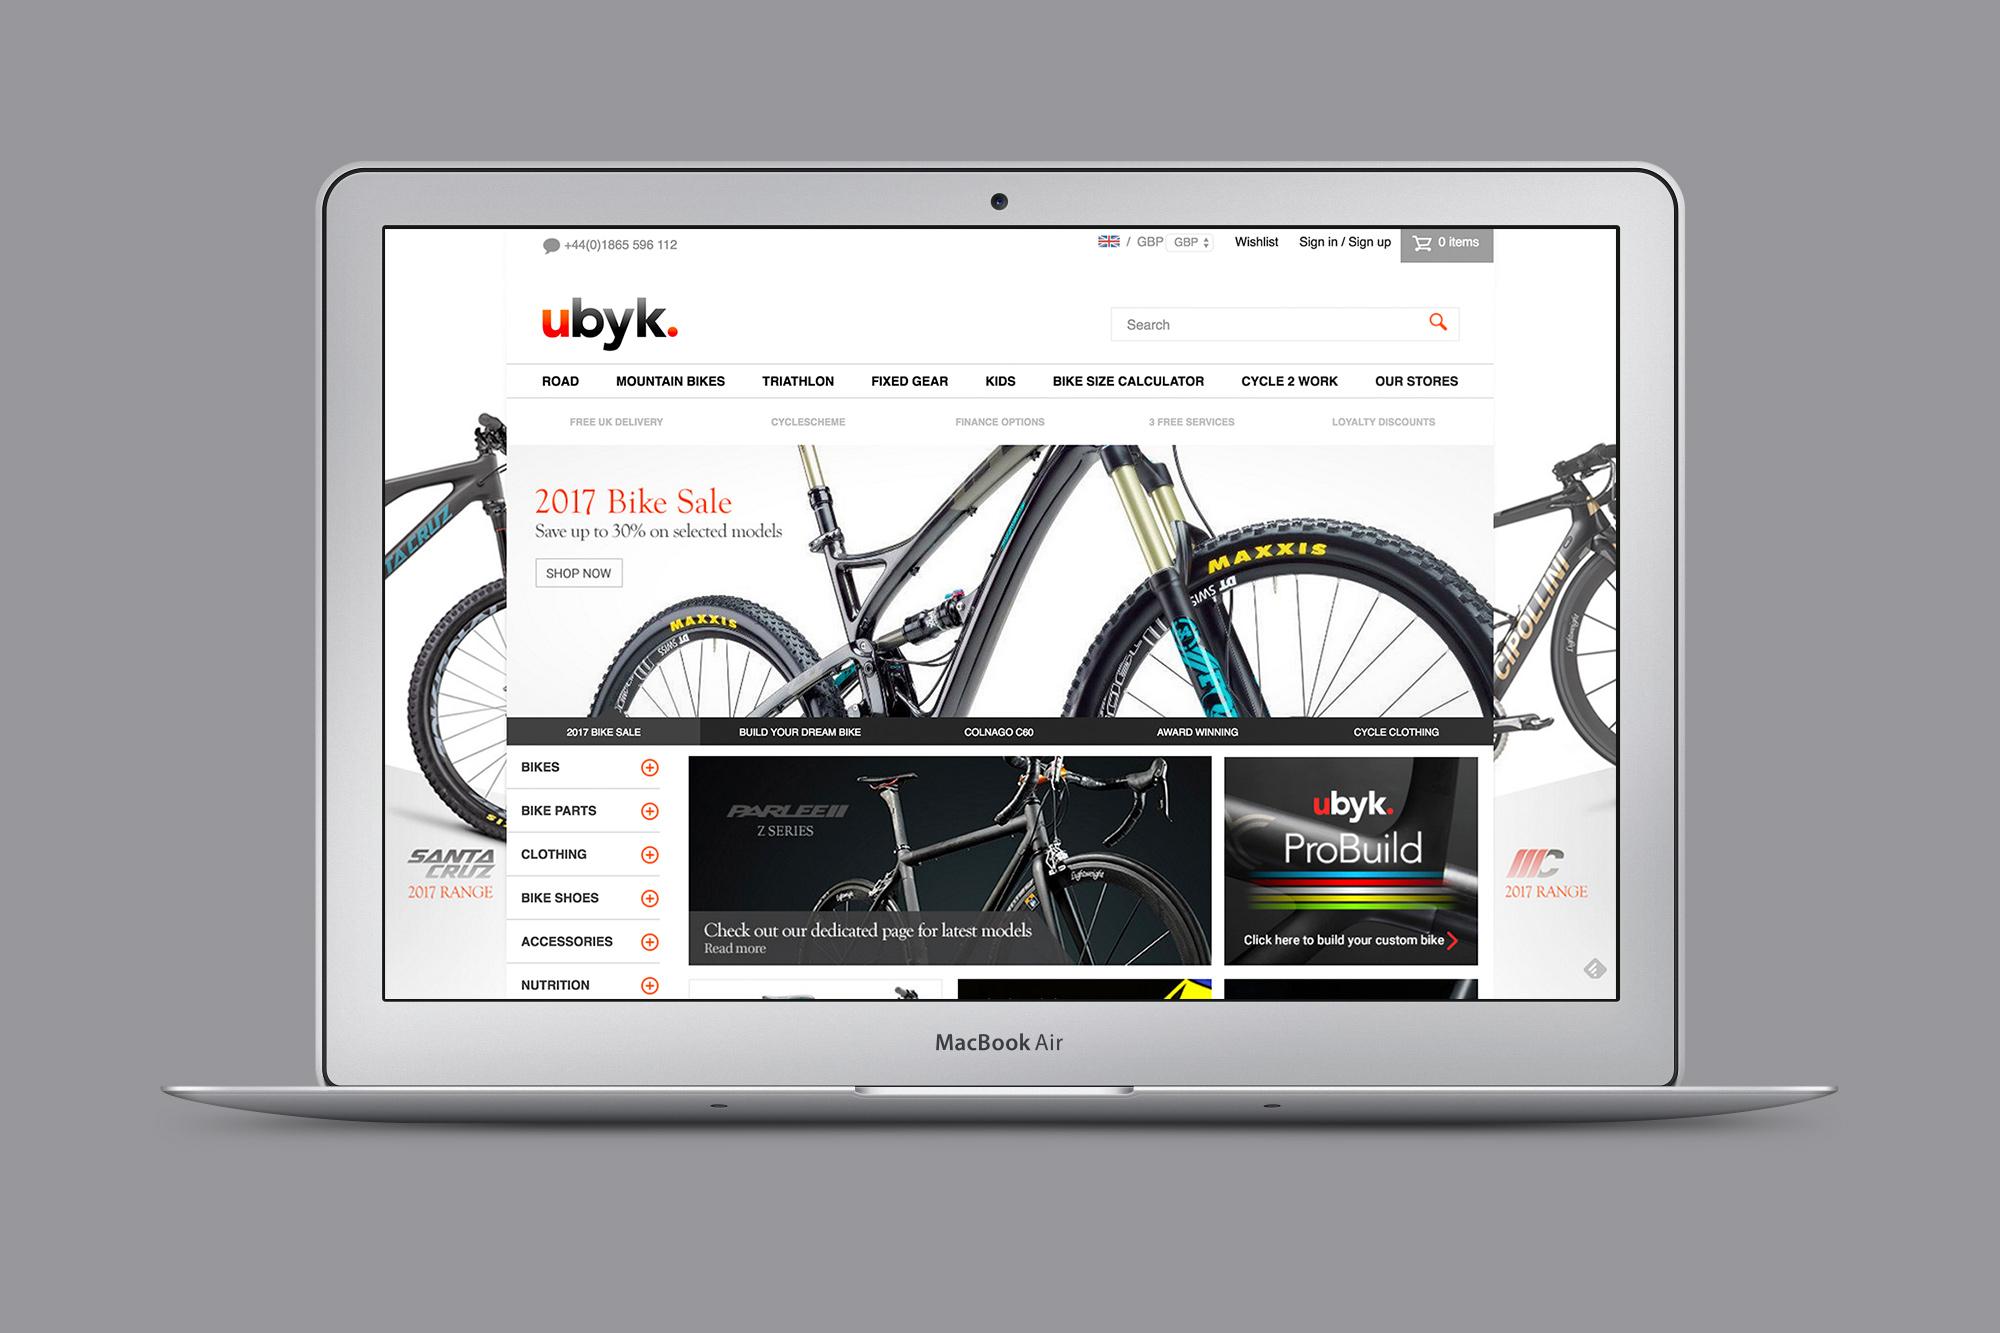 gpj_ubyk_website_v2